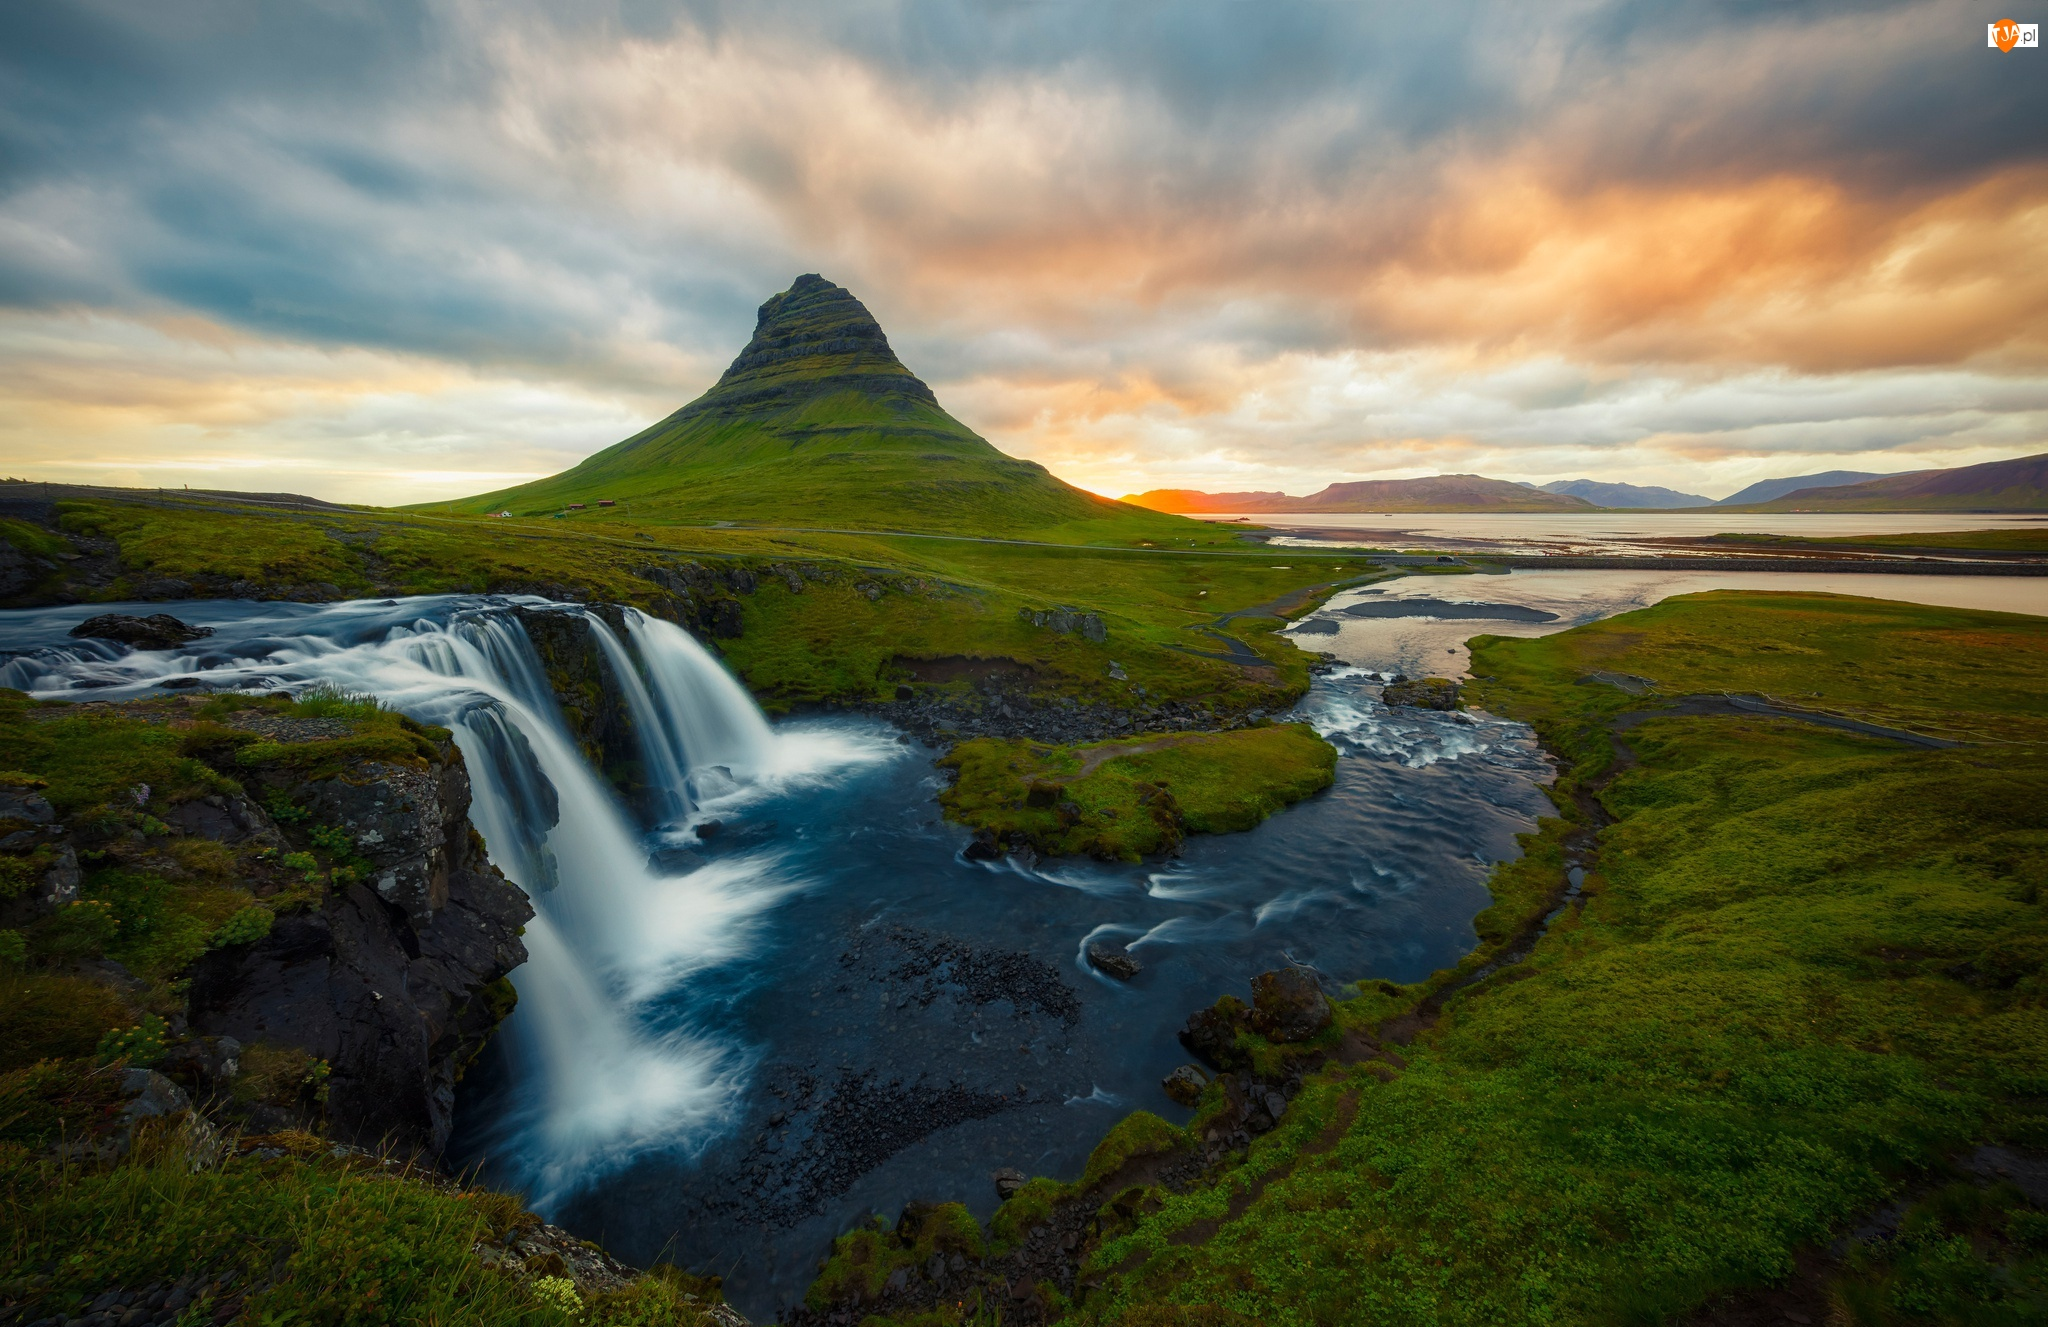 Wodospad Kirkjufellsfoss, Chmury, Półwysep Snaefellsnes, Islandia, Góra Kirkjufell